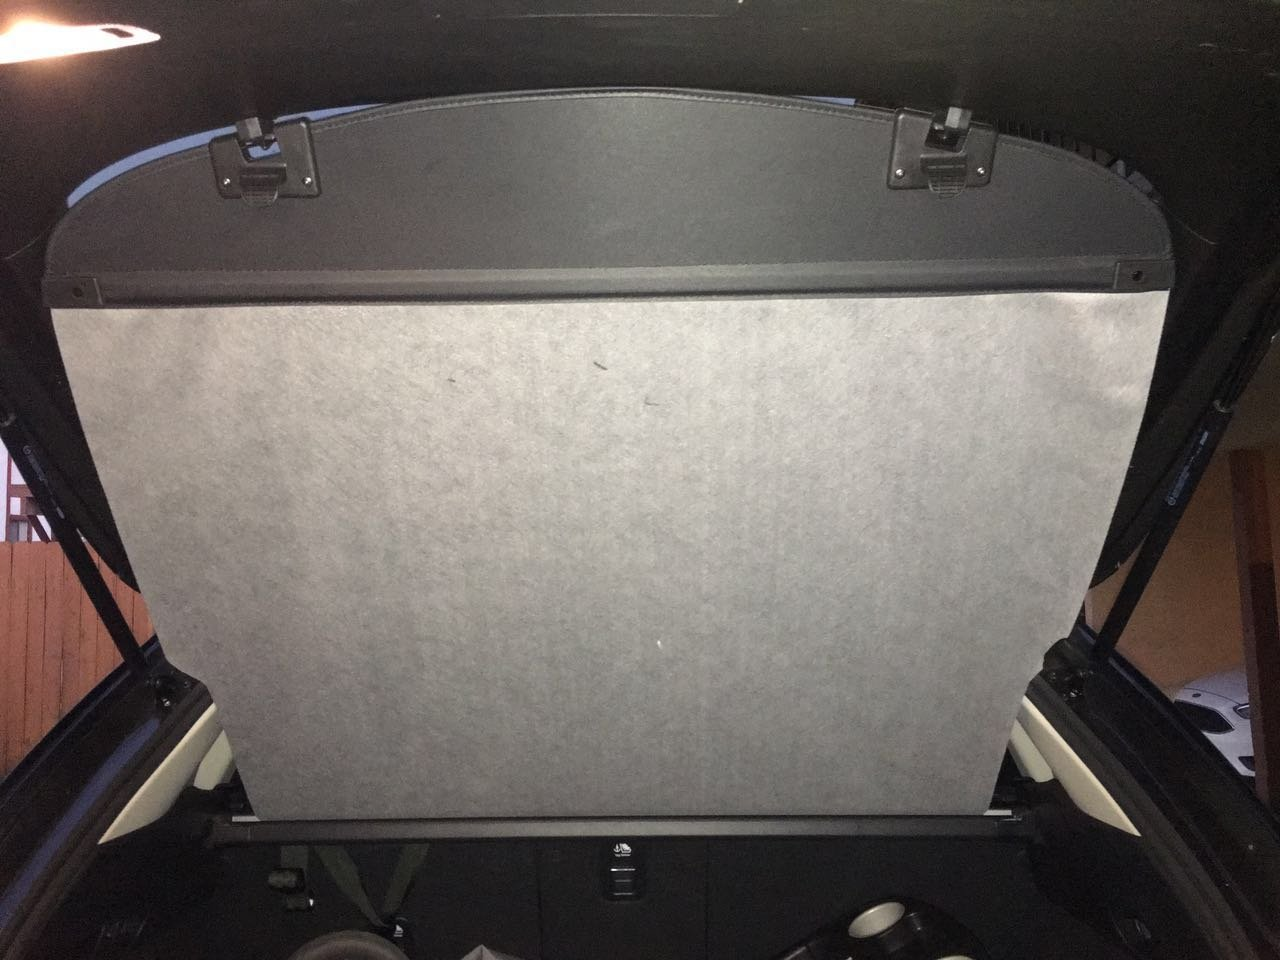 Kaungka Rubber Cargo Liner Rear Cargo Tray Trunk Floor Mat Waterproof Protector for 2017 2018 2019 Mazda CX-5